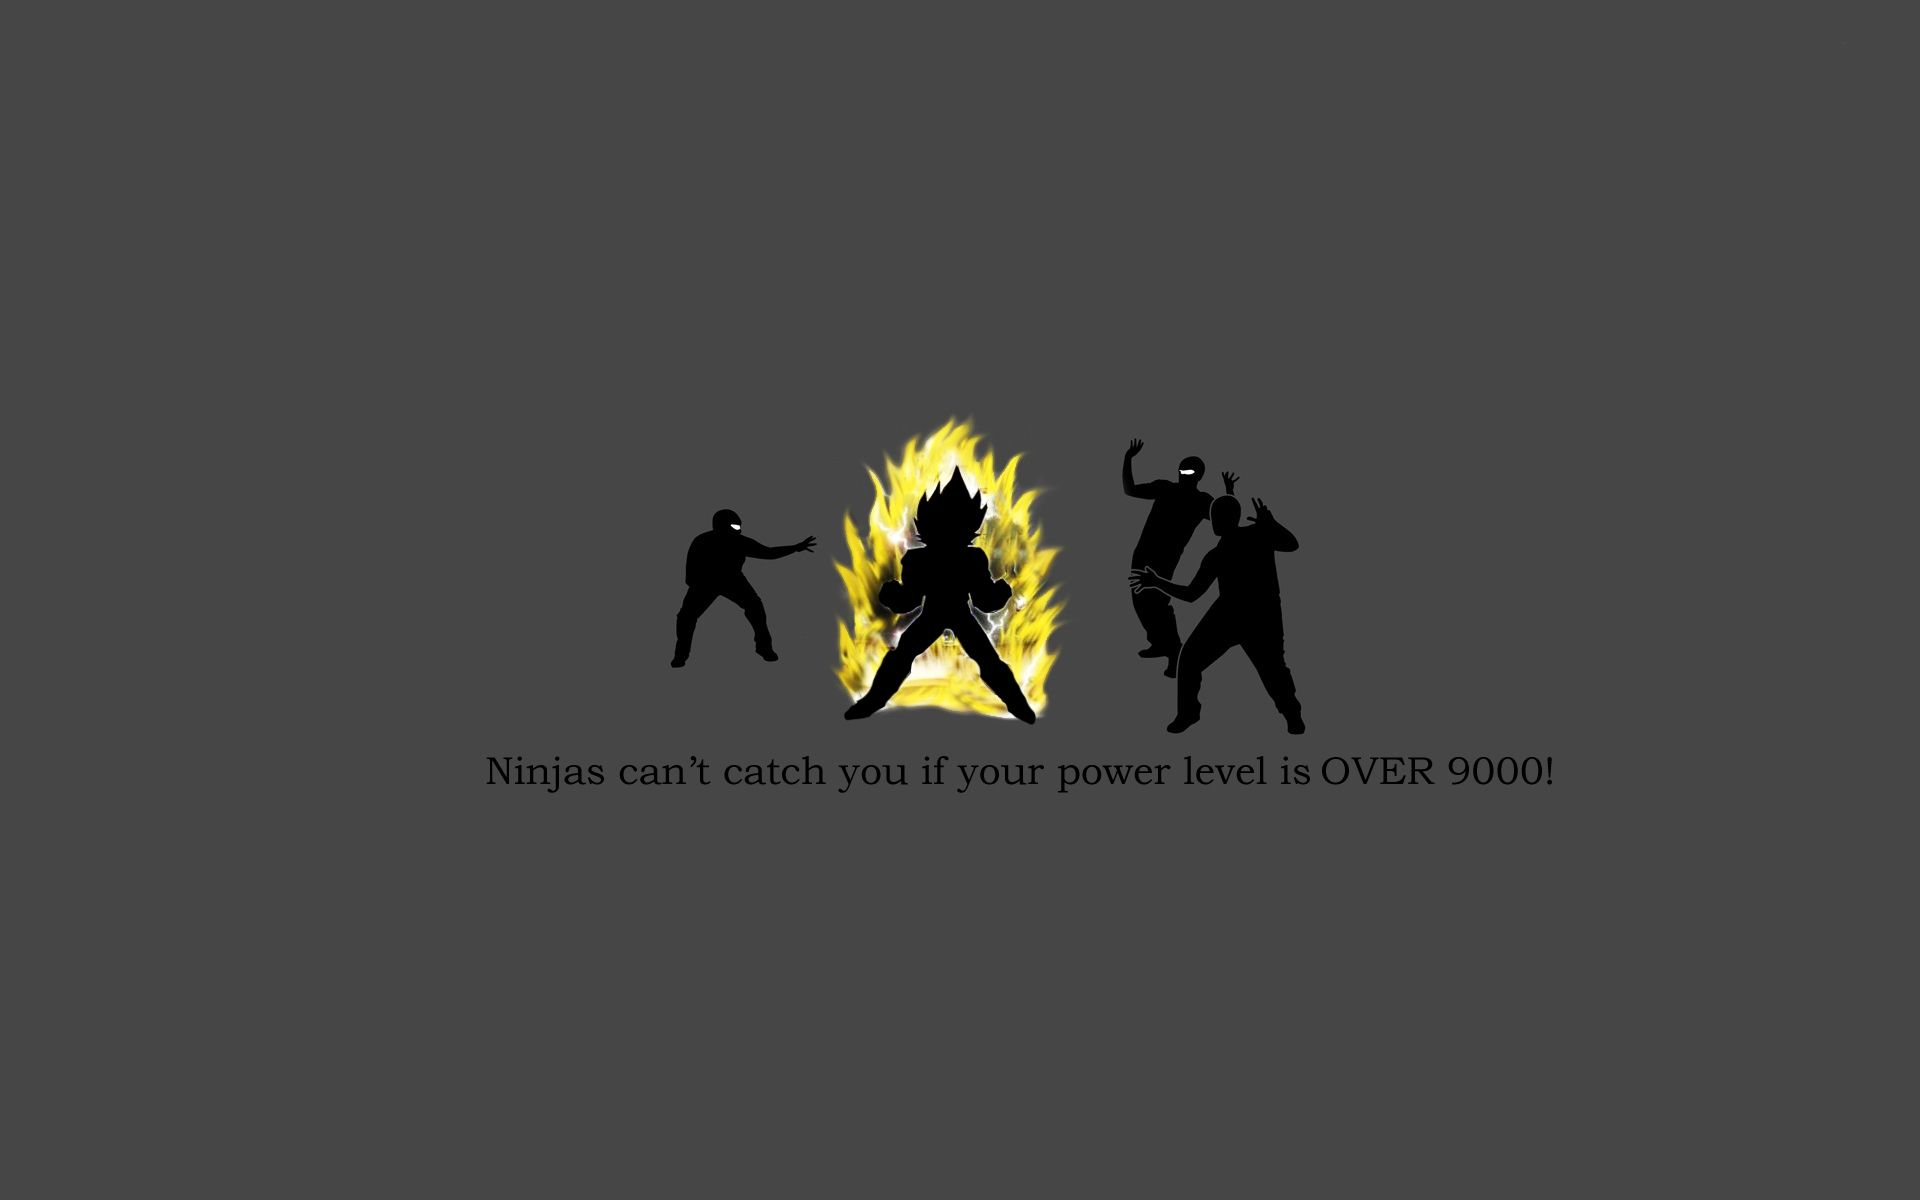 Best Hd Meme Art Wallpaper Backgrounds Funniest Theme Pictures